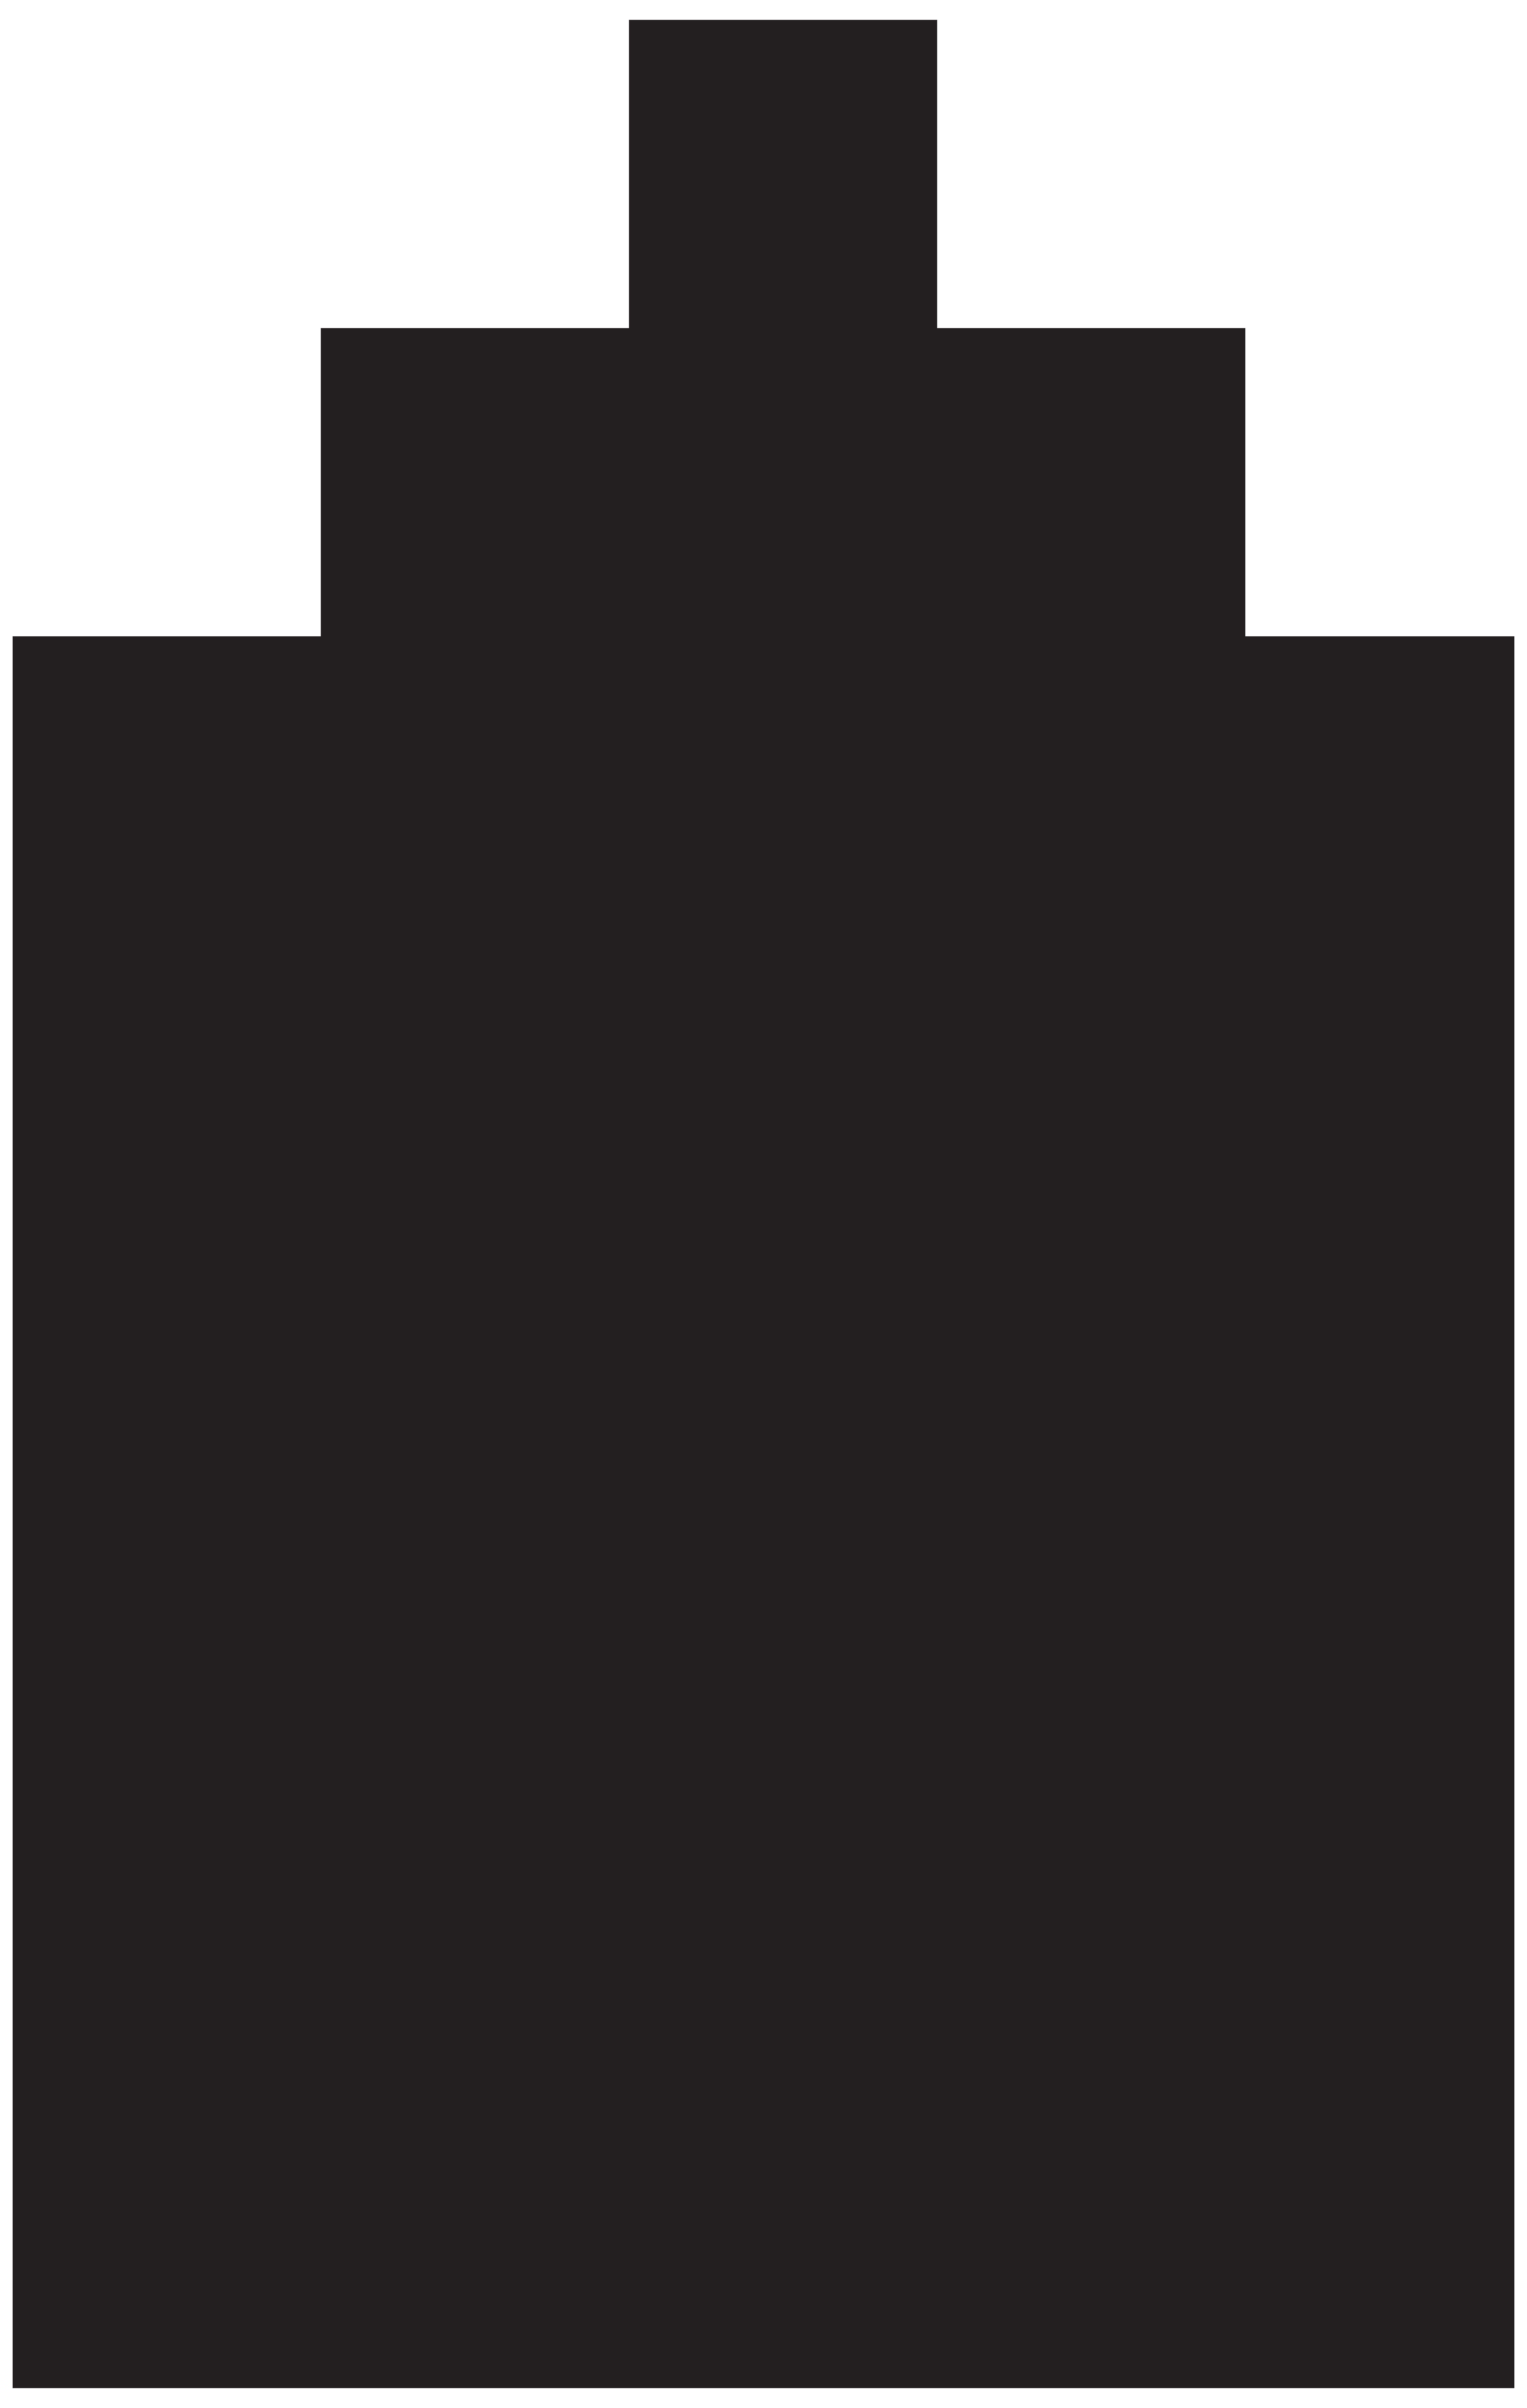 Pine Tree Silhouette Clip Art Image.